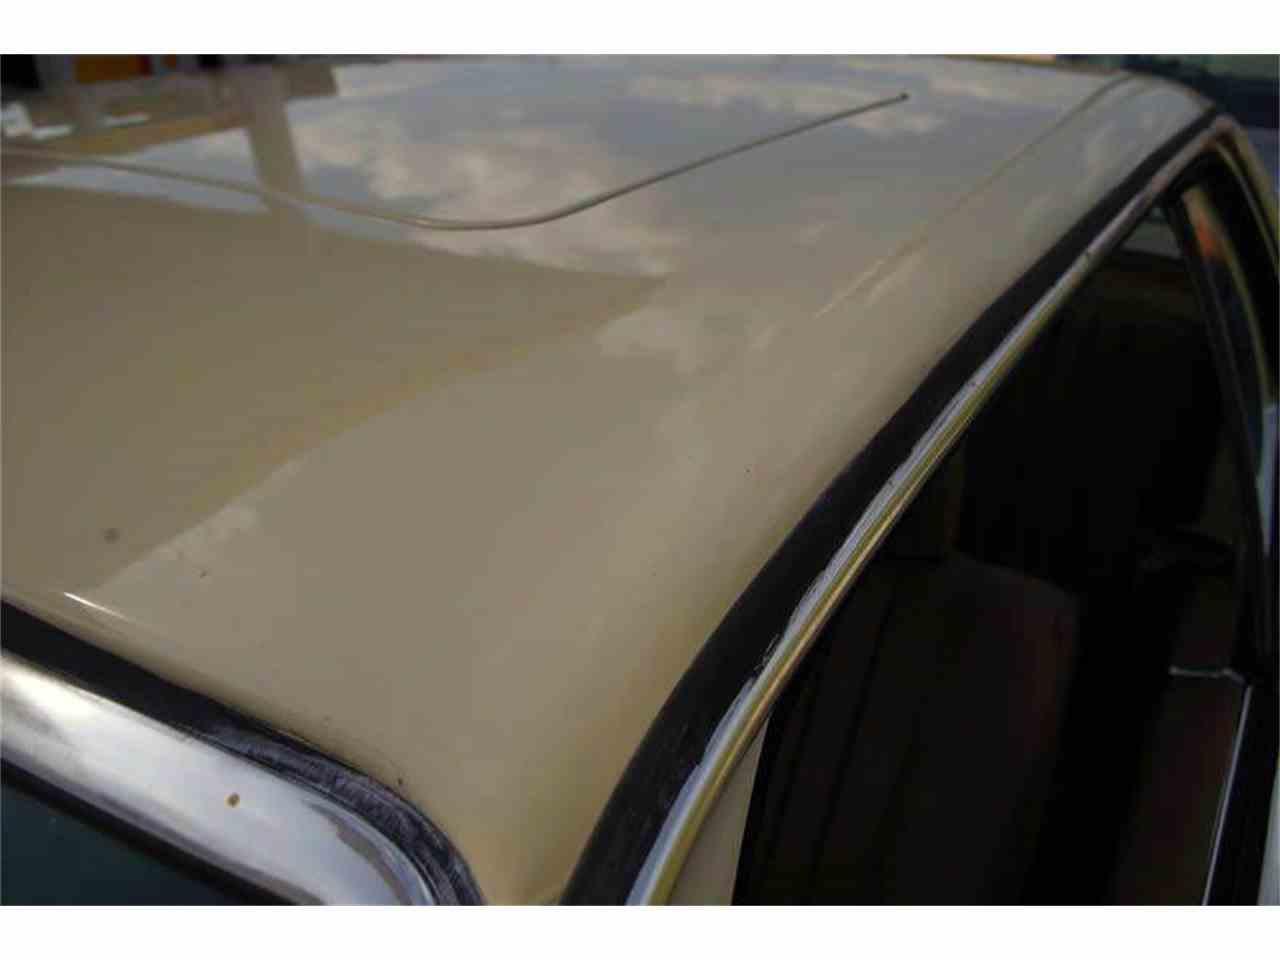 1985 mercedes benz 300 for sale cc 843935 for Fort worth mercedes benz dealership